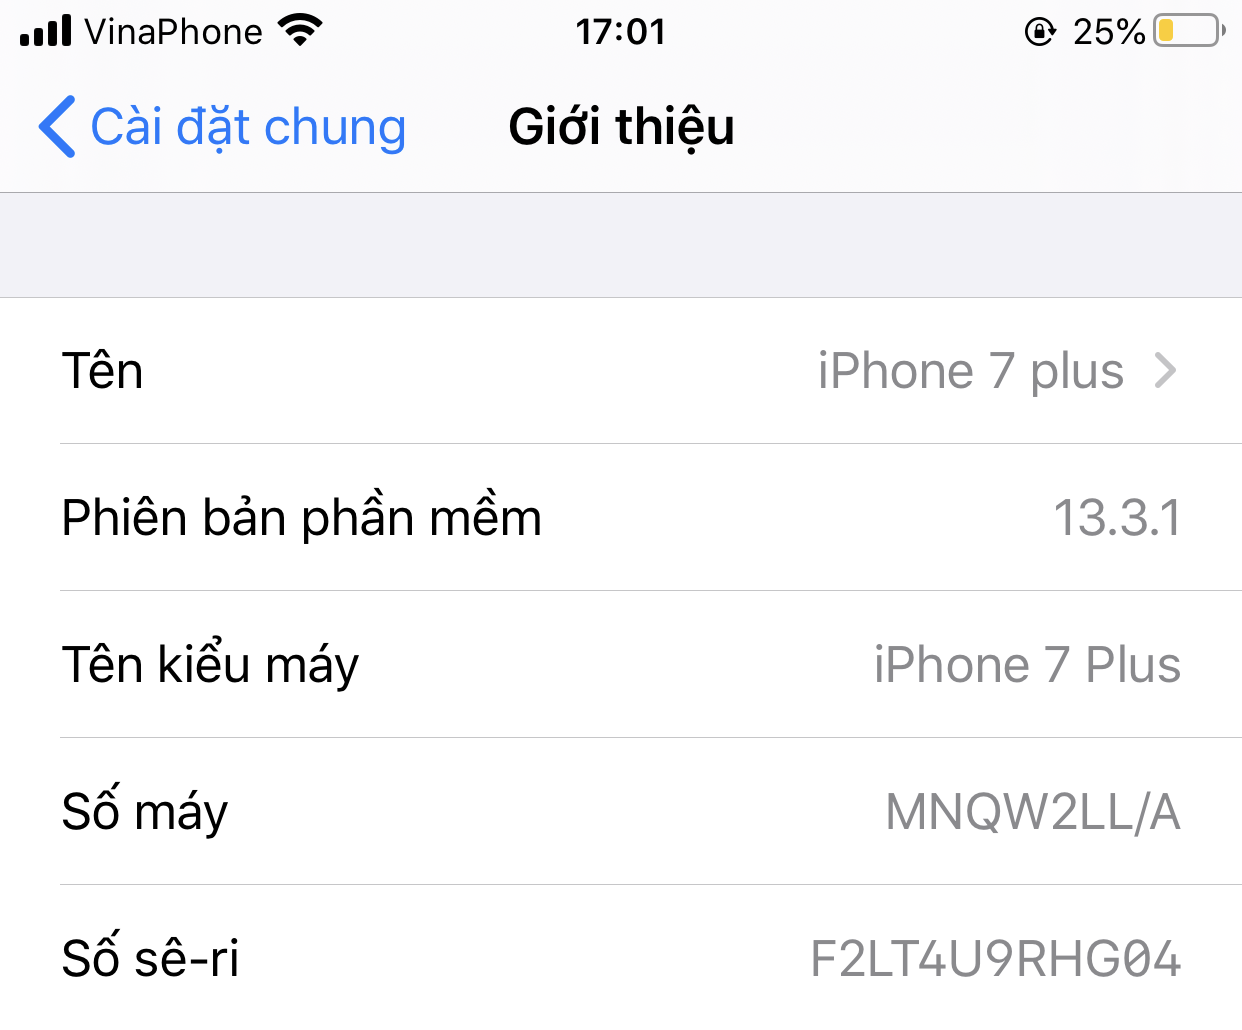 Cach-nhan-biet-dien-thoai-iPhone-da-duoc-Refurbished-3